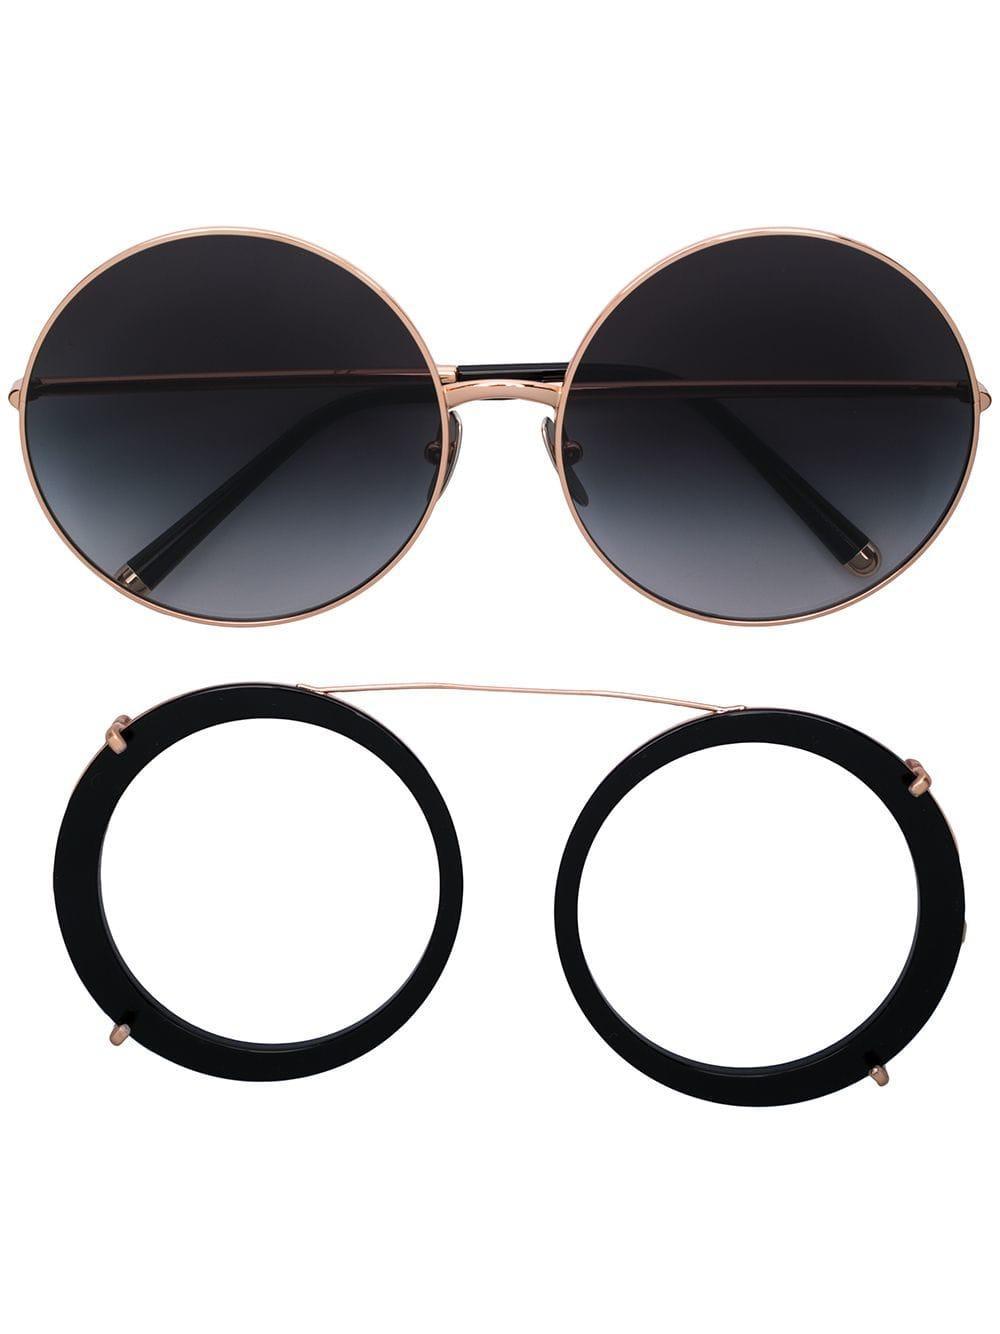 5ecab22a5324 Dolce   Gabbana - Metallic Limited Edition Clip-on Round Sunglasses - Lyst.  View fullscreen